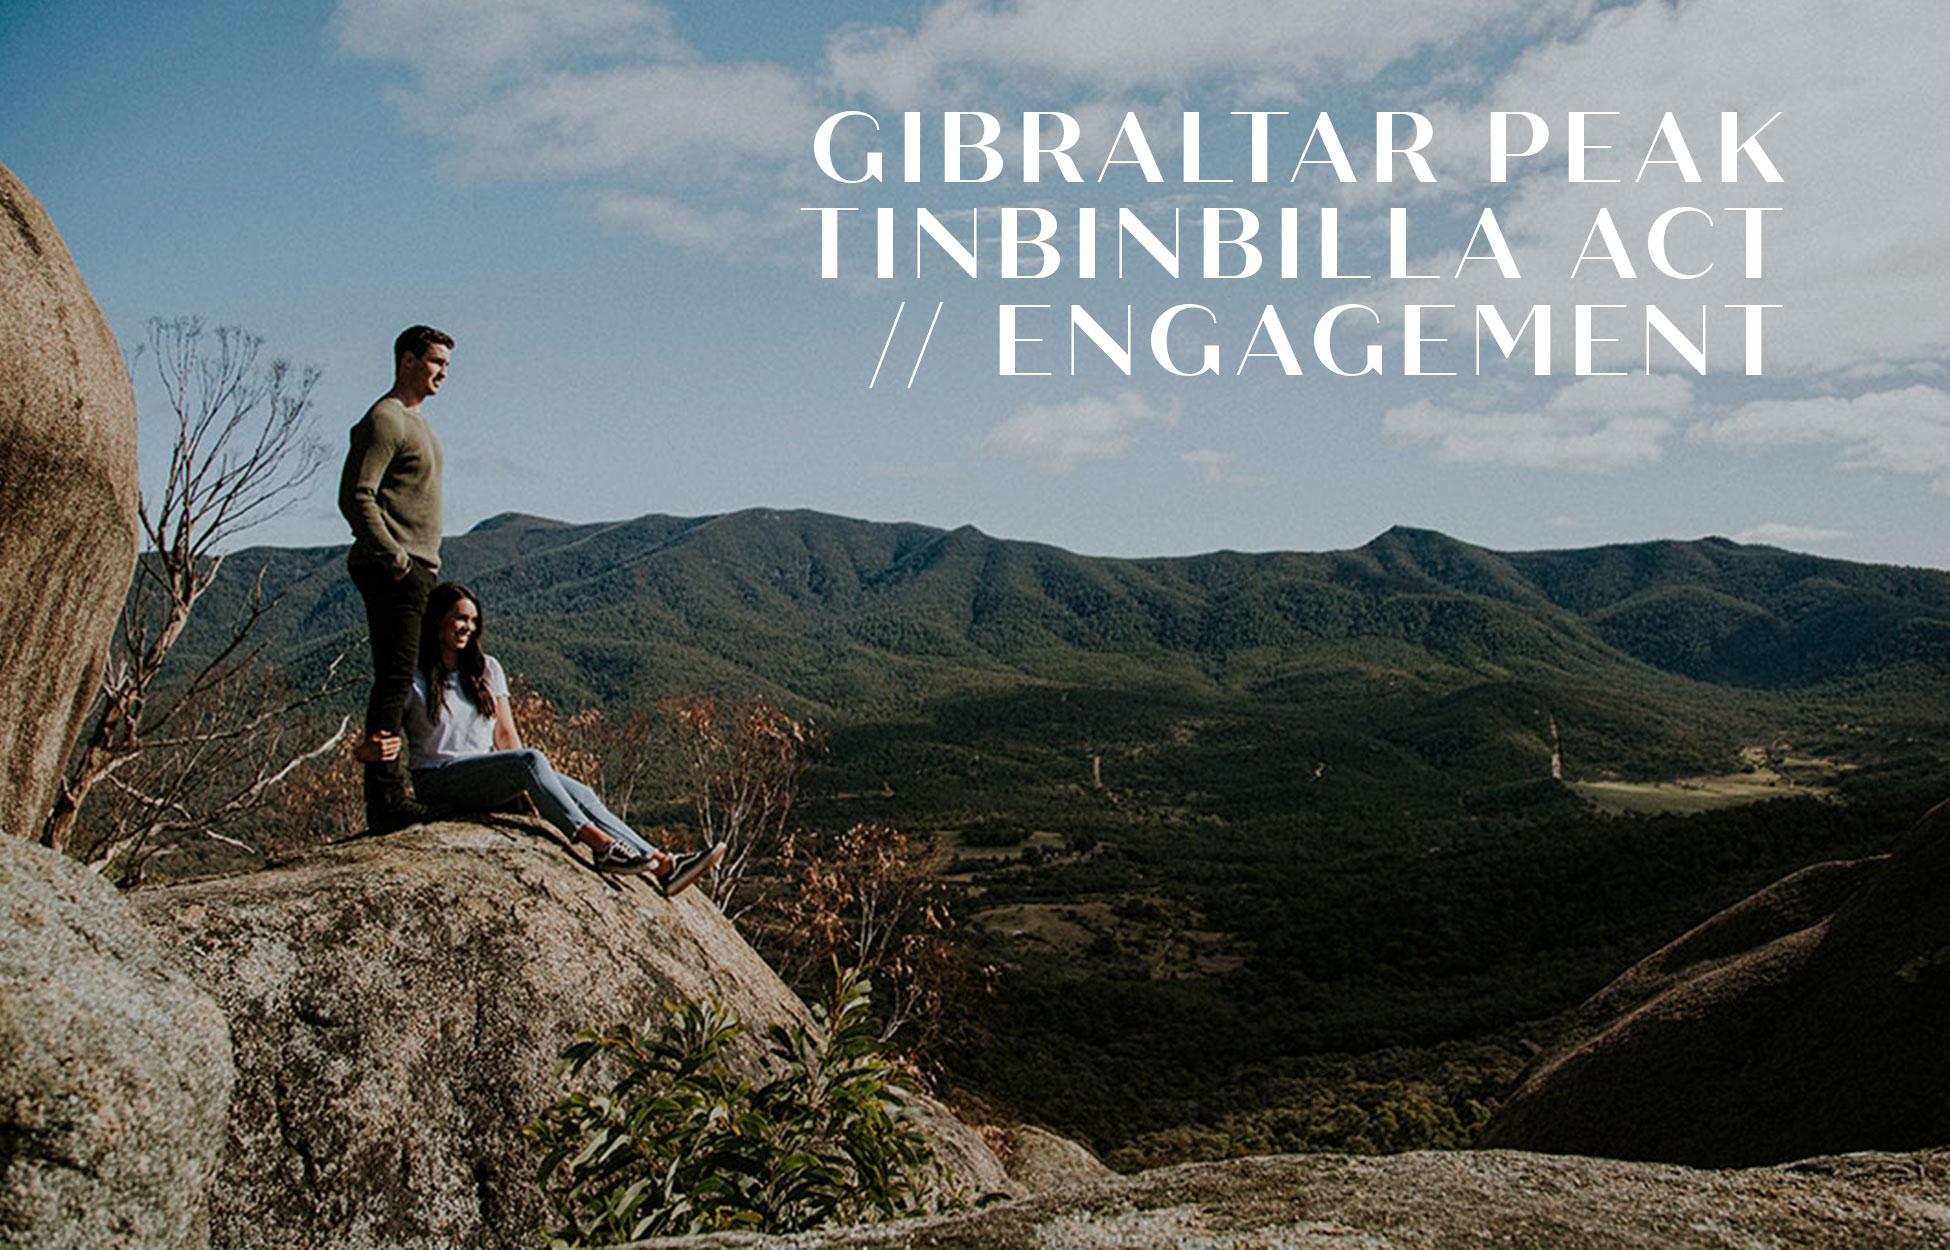 Engagement photography Gibraltar Peak Tinbinbilla Canberra ACT Neil Hole Photography